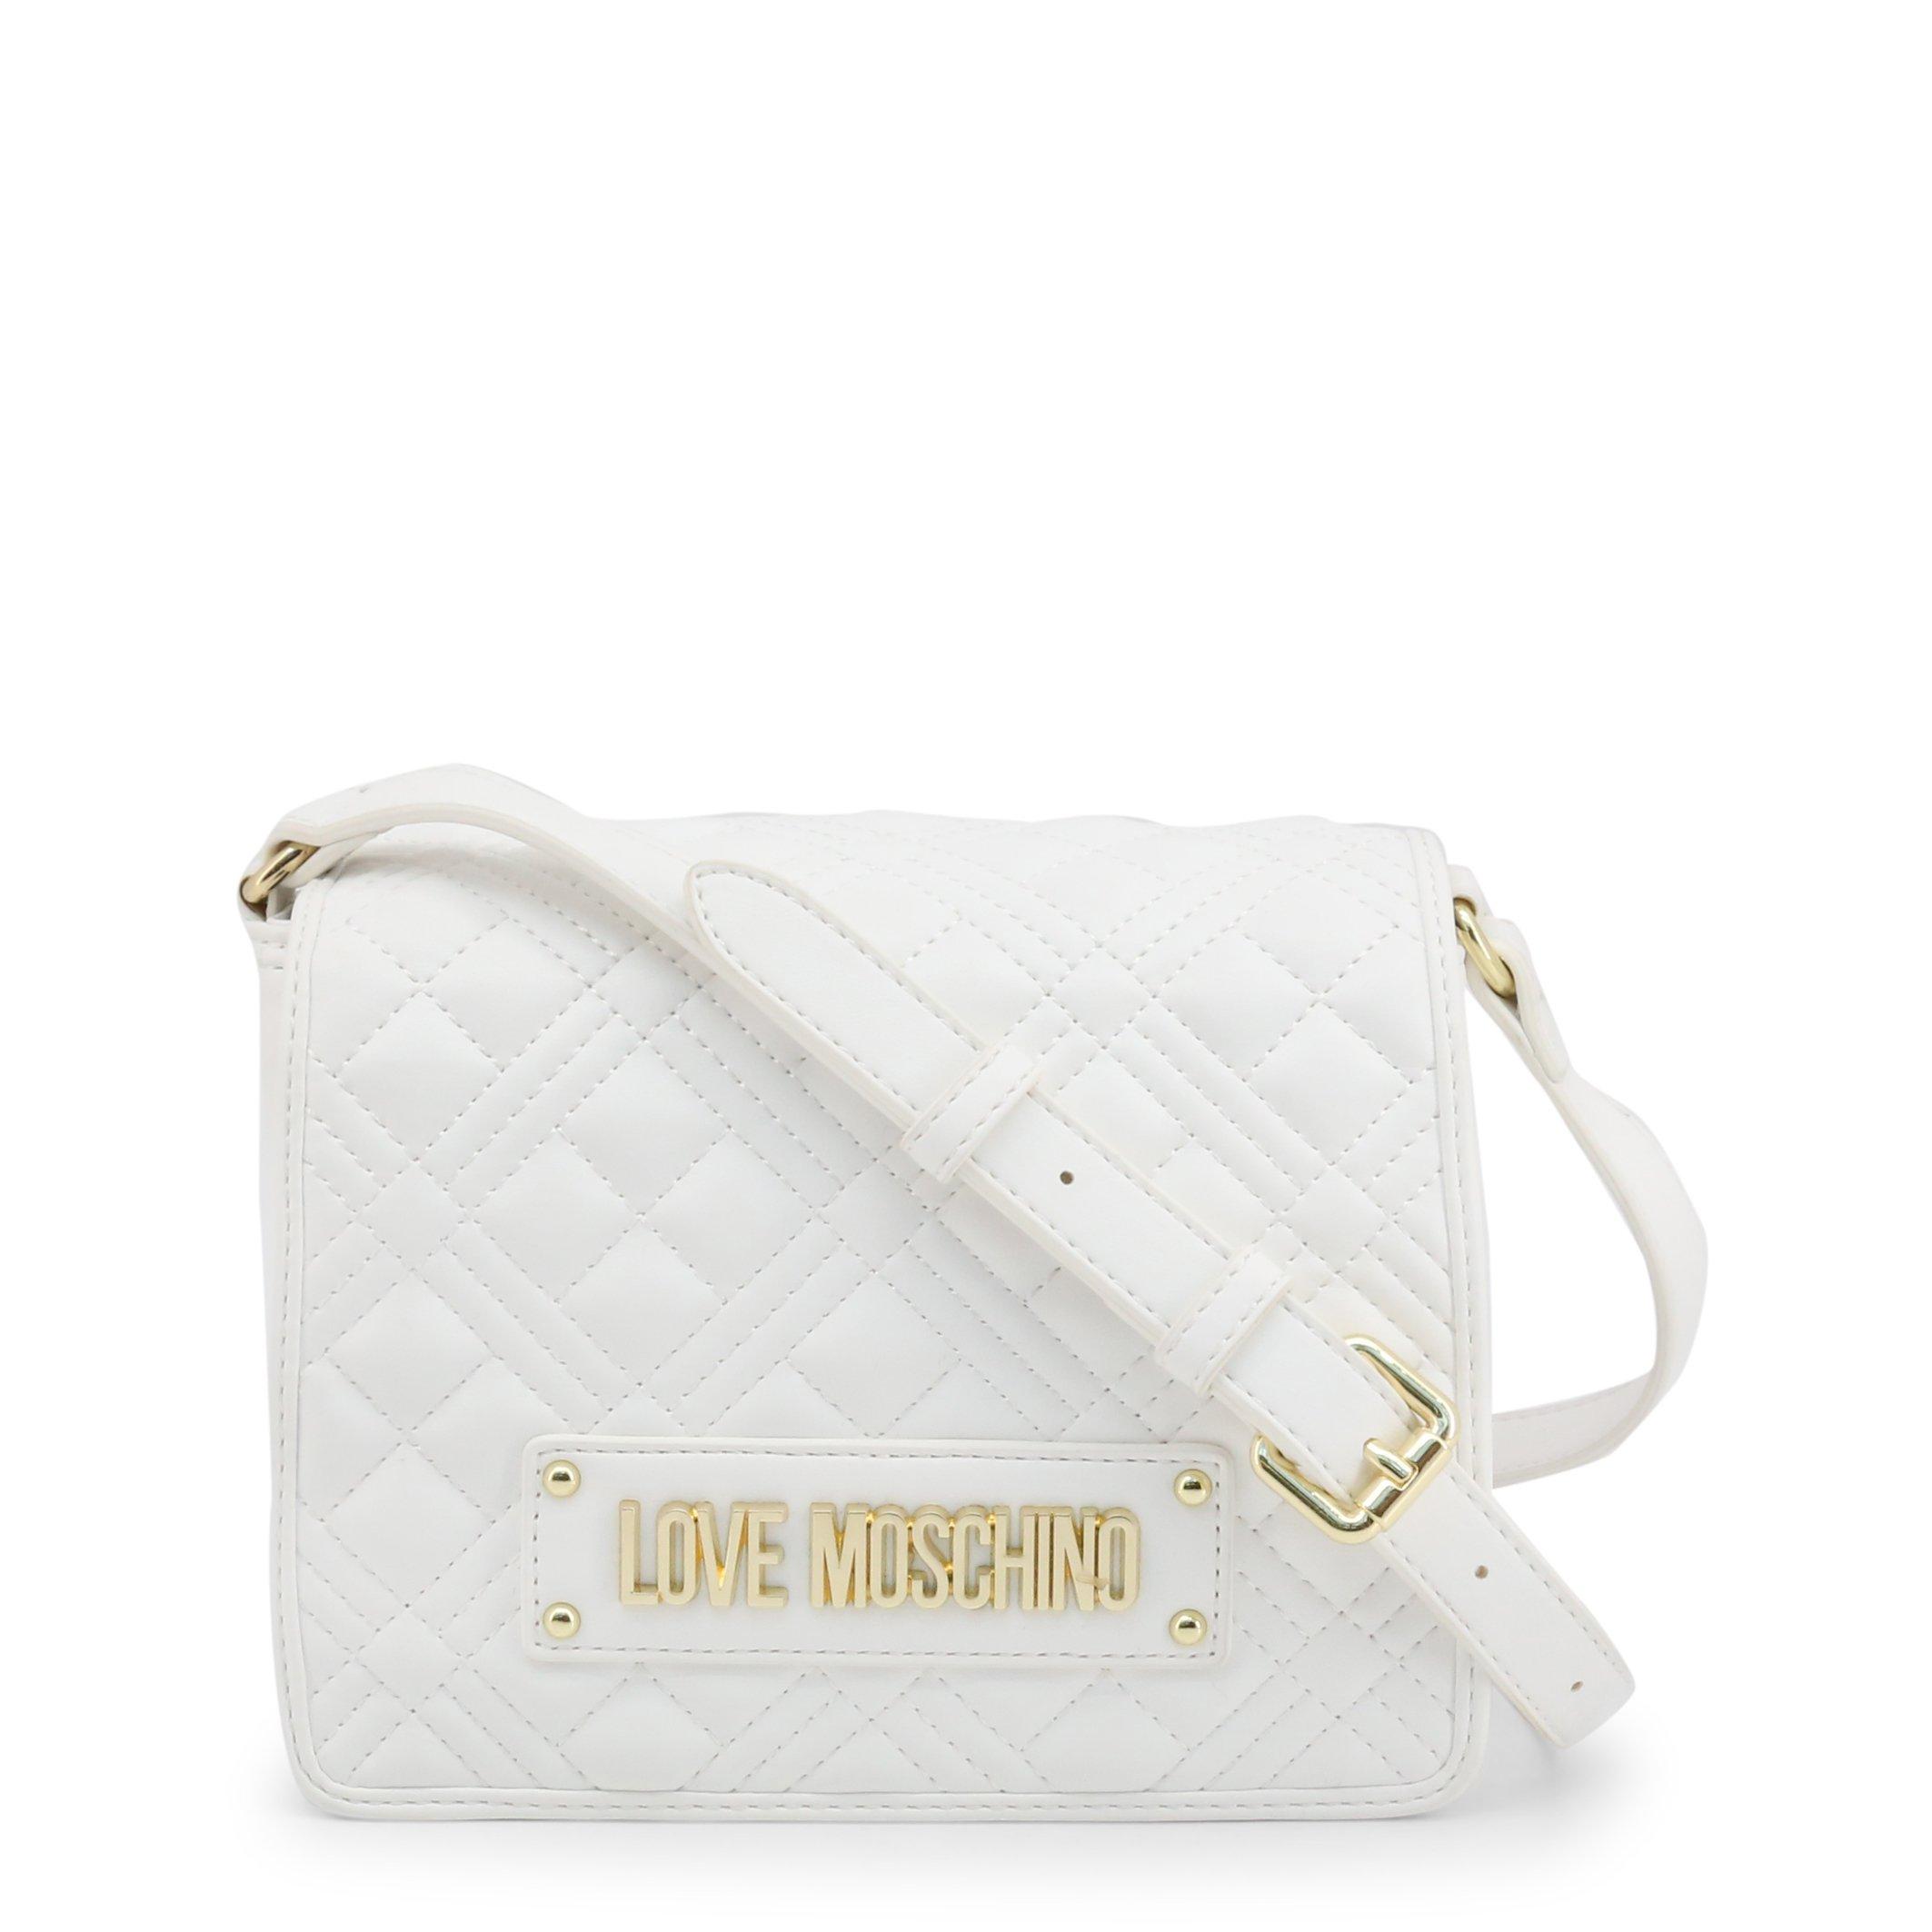 Love Moschino Women's Crossbody Bag Various Colours JC4002PP1CLA0 - white NOSIZE